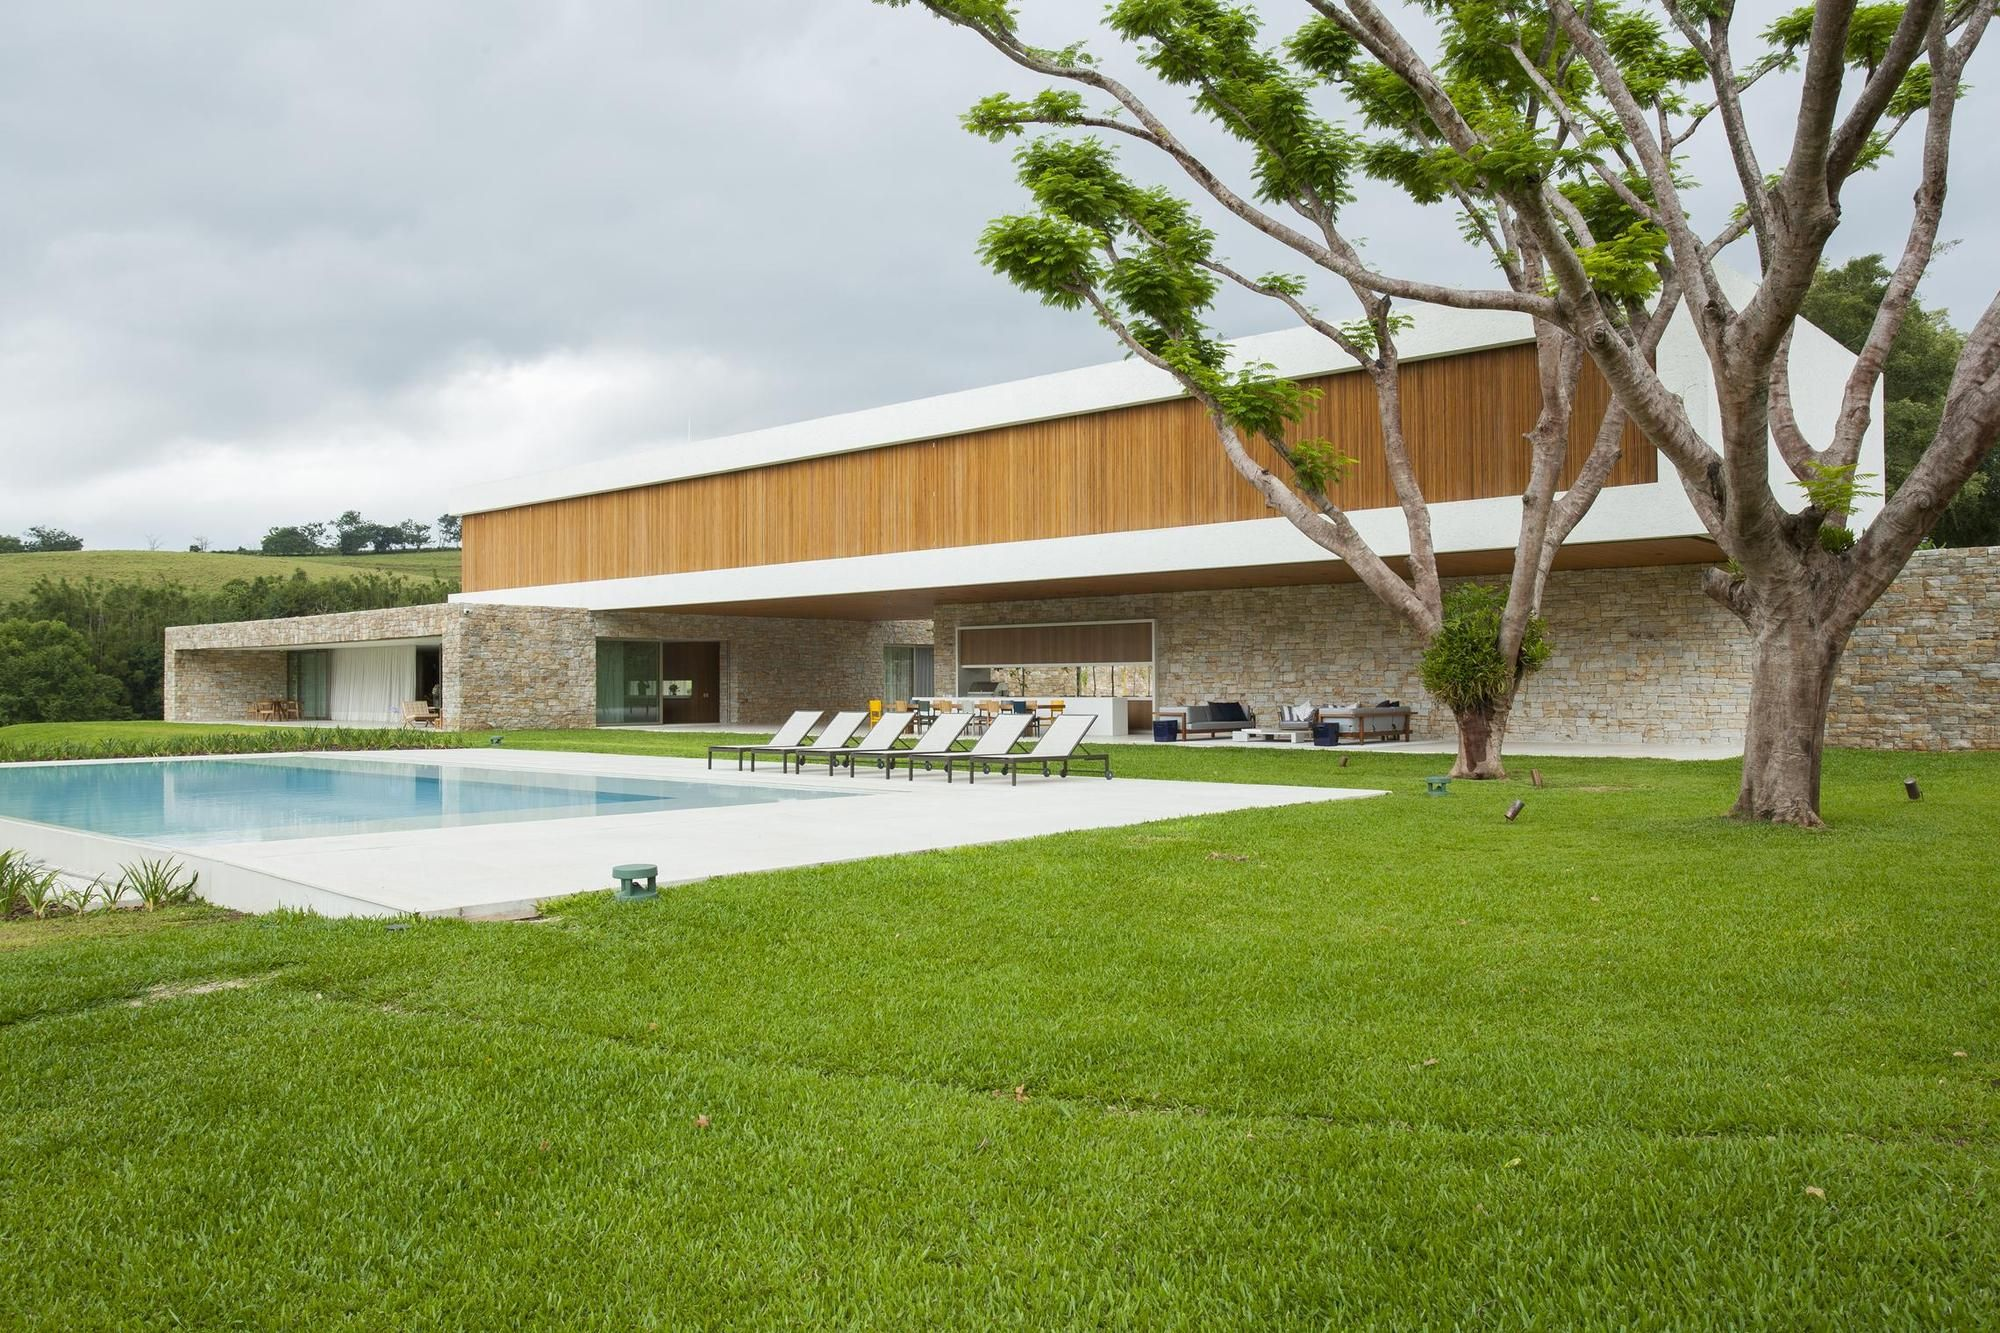 Galeria de Residência Itatiba / RoccoVidal Perkins+Will - 6 ...